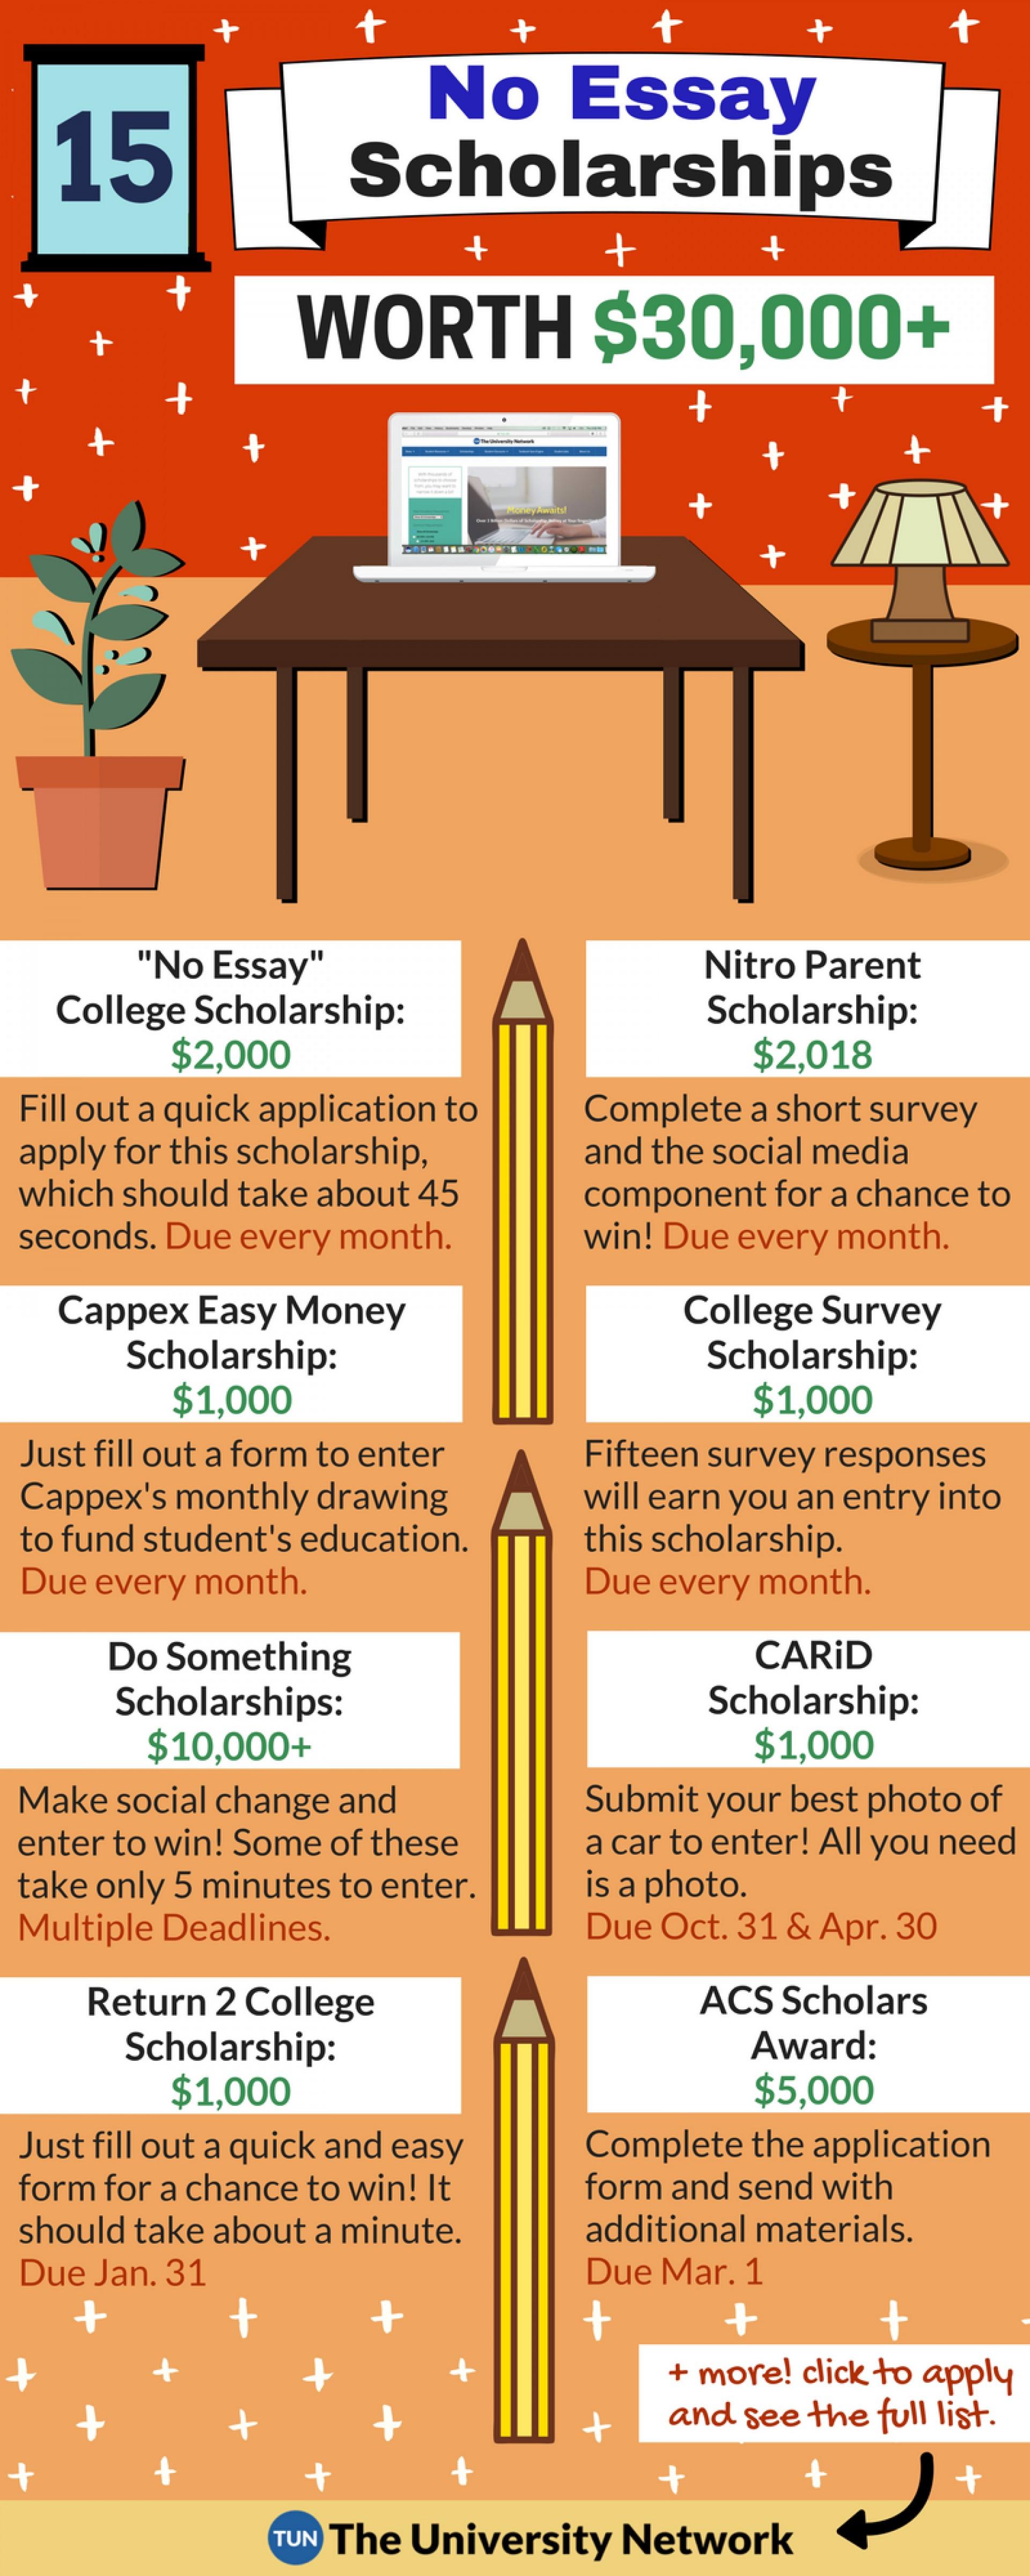 009 No Essay Scholarships For High School Seniors Rare 2017 2019 1920